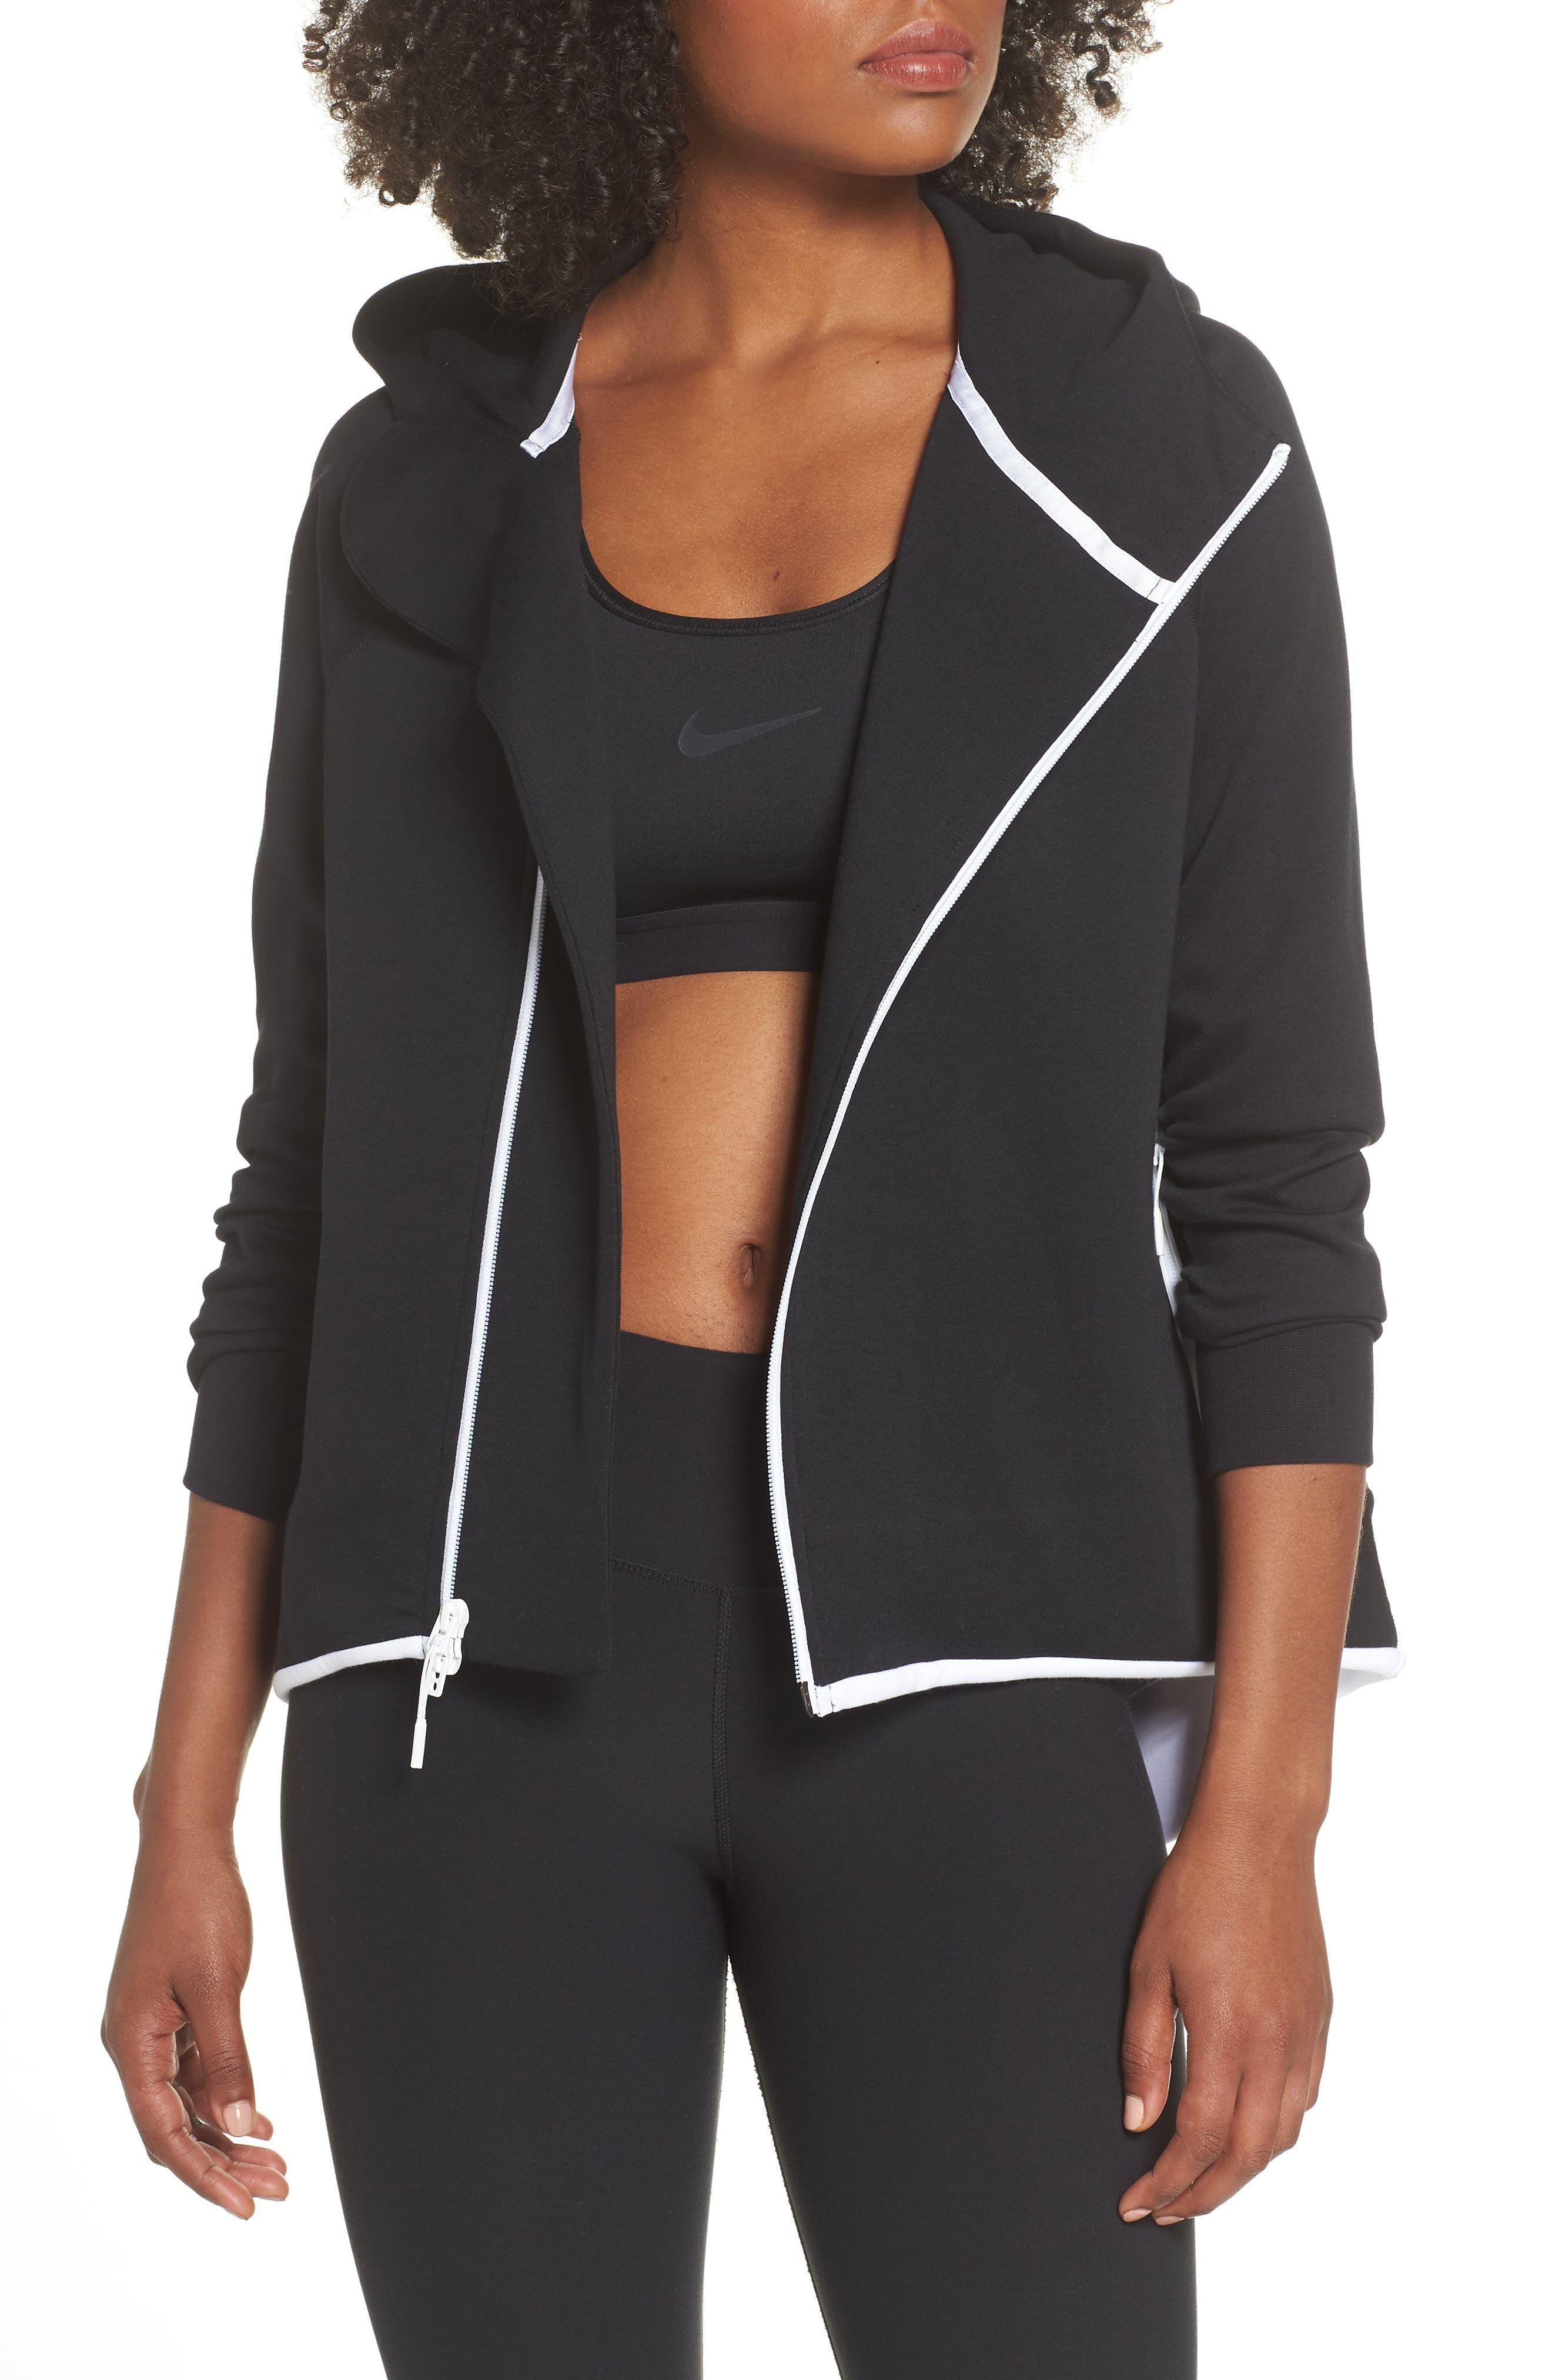 Sportswear Tech Fleece Cape Jacket,                             Main thumbnail 1, color,                             BLACK/ WHITE